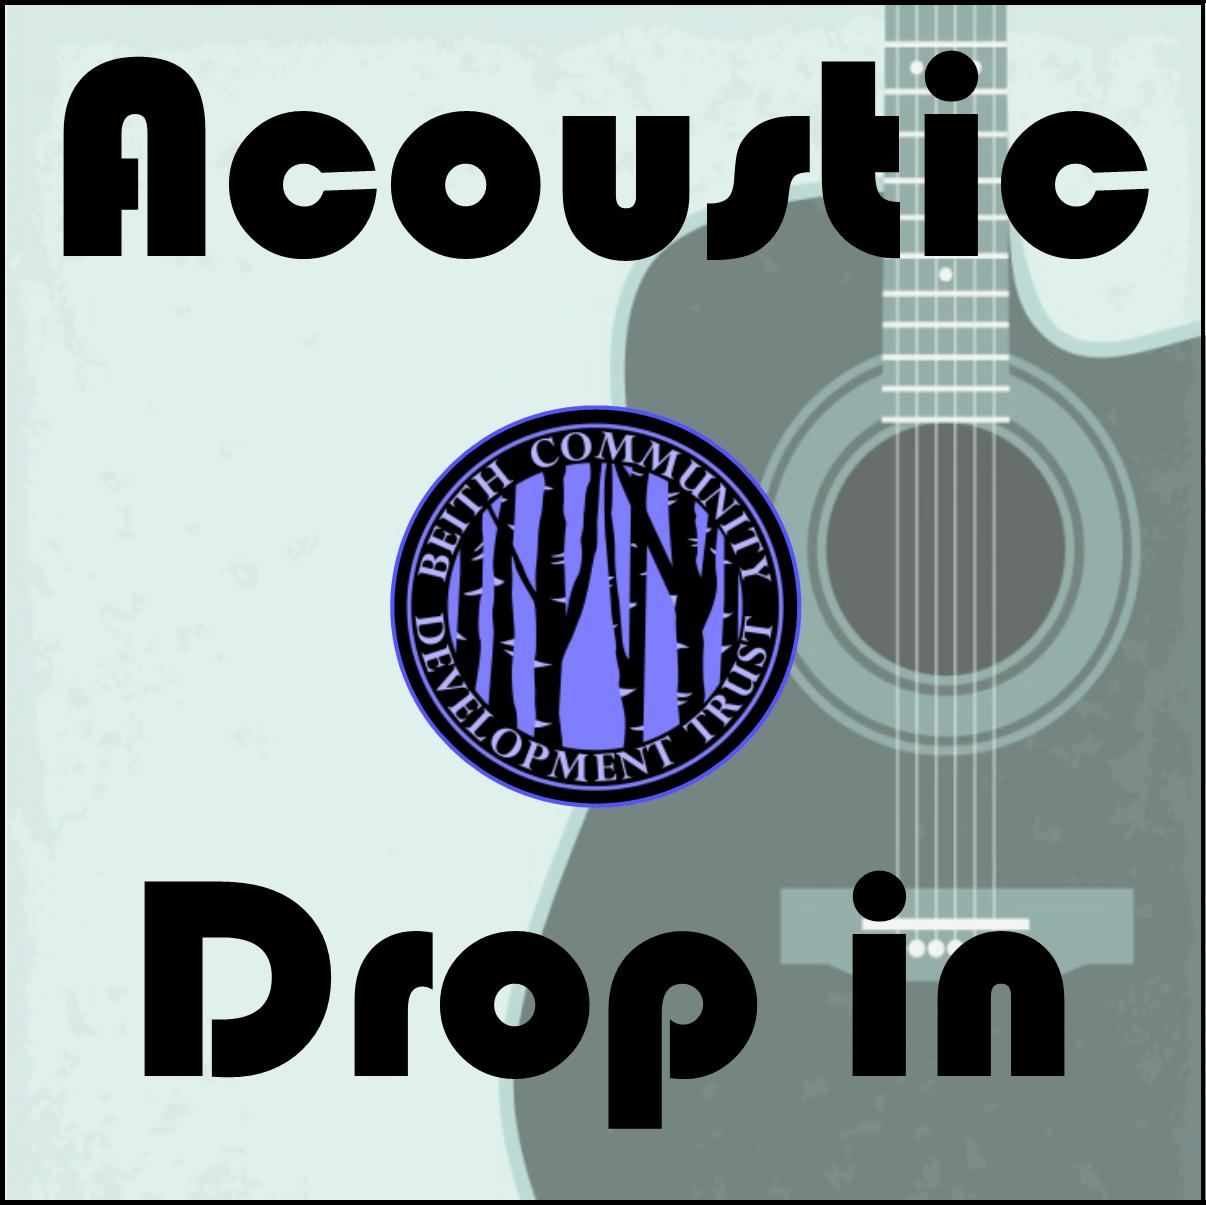 Acoustic Dropin's